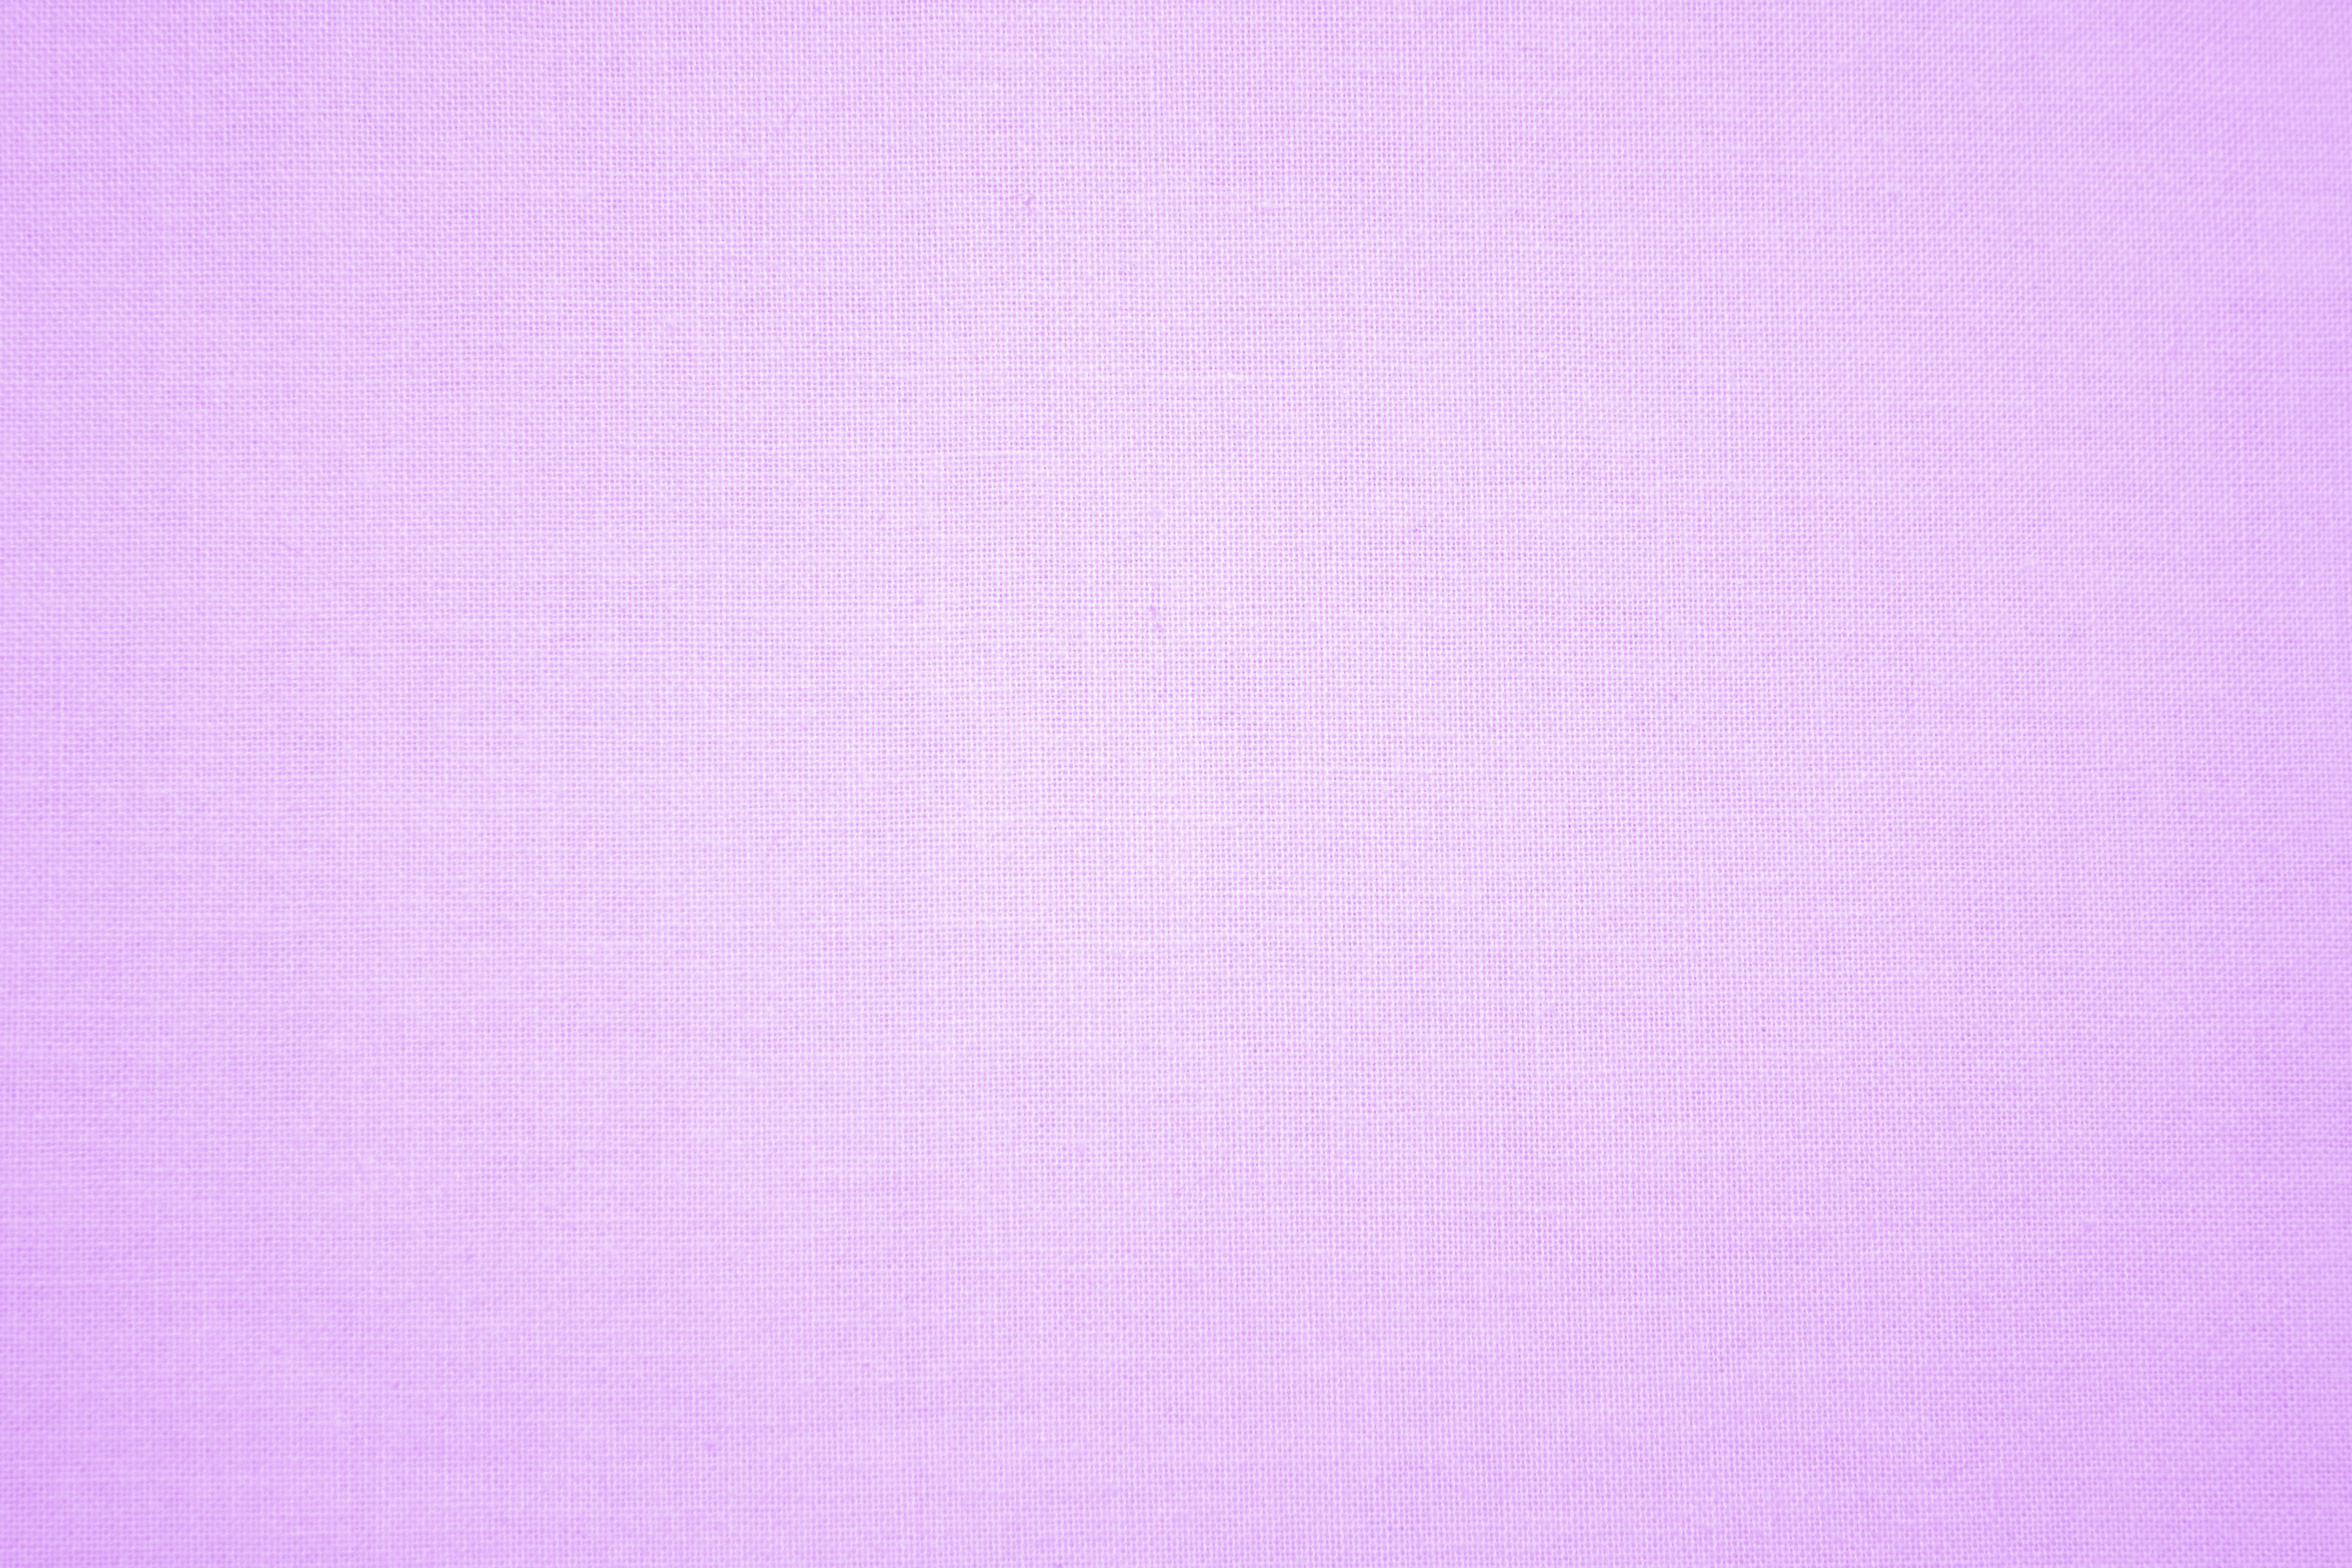 Light Purple Backgrounds 3600x2400